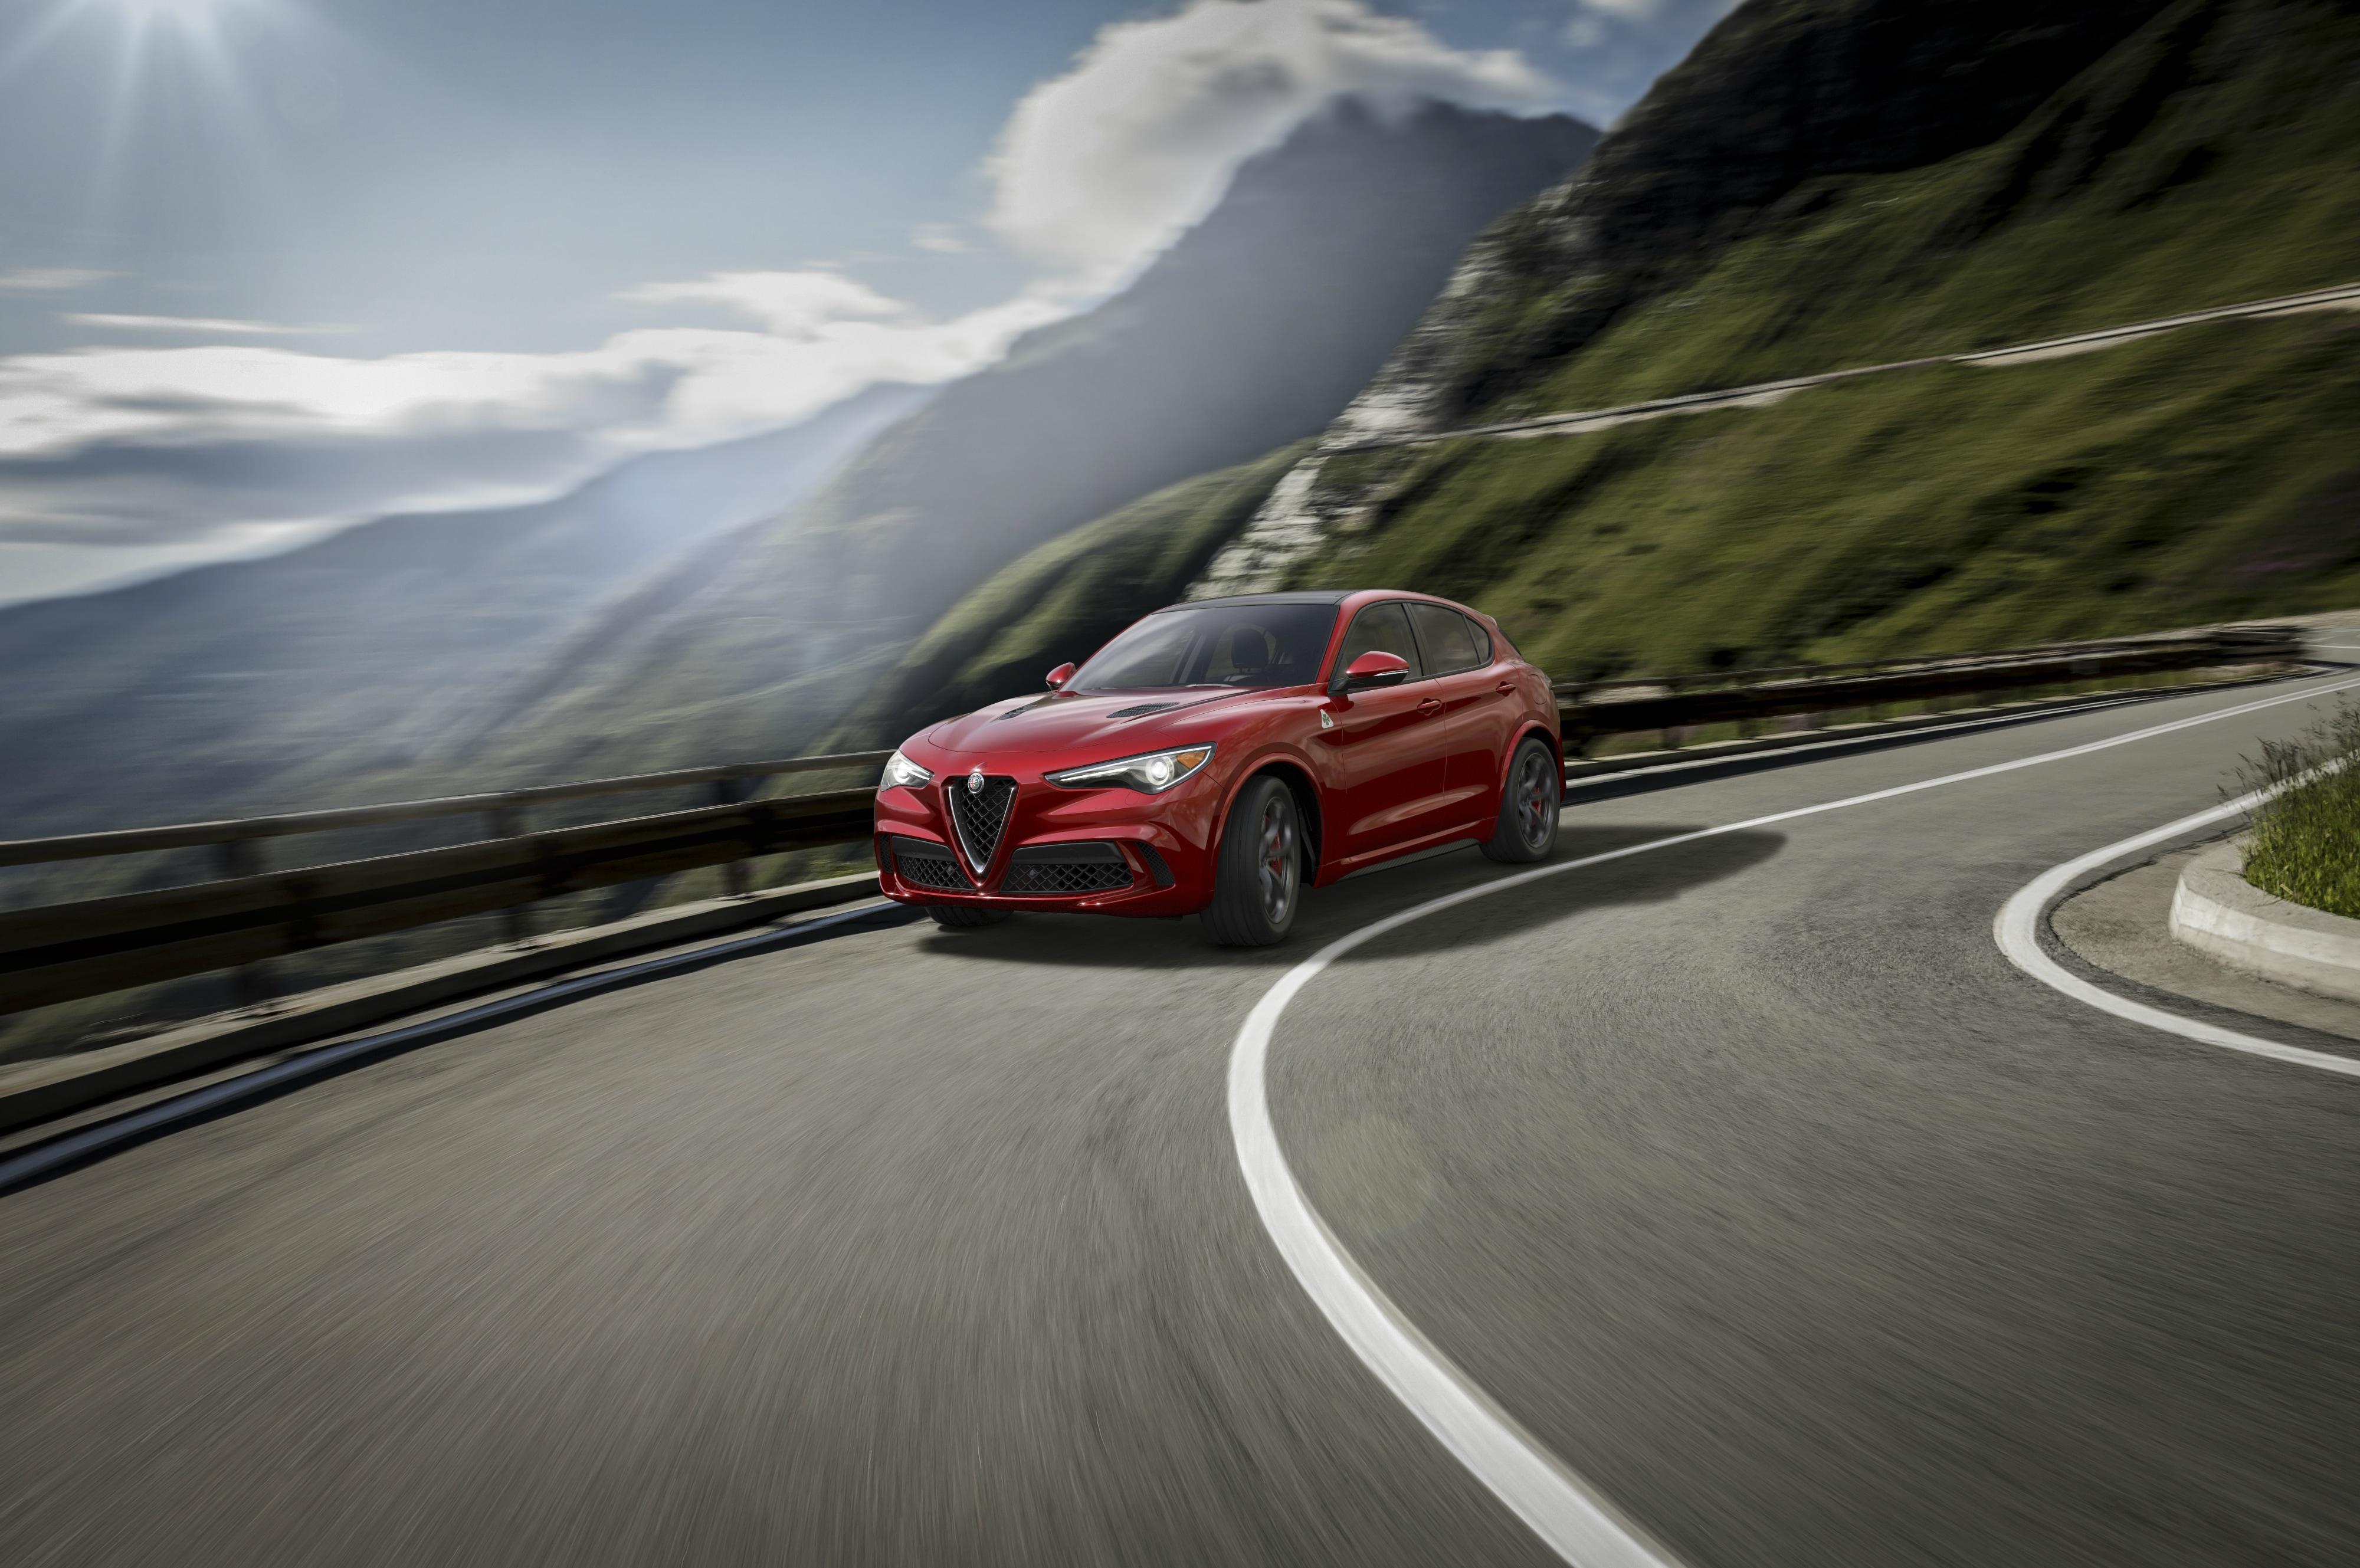 2018 Alfa Romeo Stelvio Quadrifoglio: Performance, Design >> The All New 2018 Stelvio Alfa Romeo Of Salt Lake City